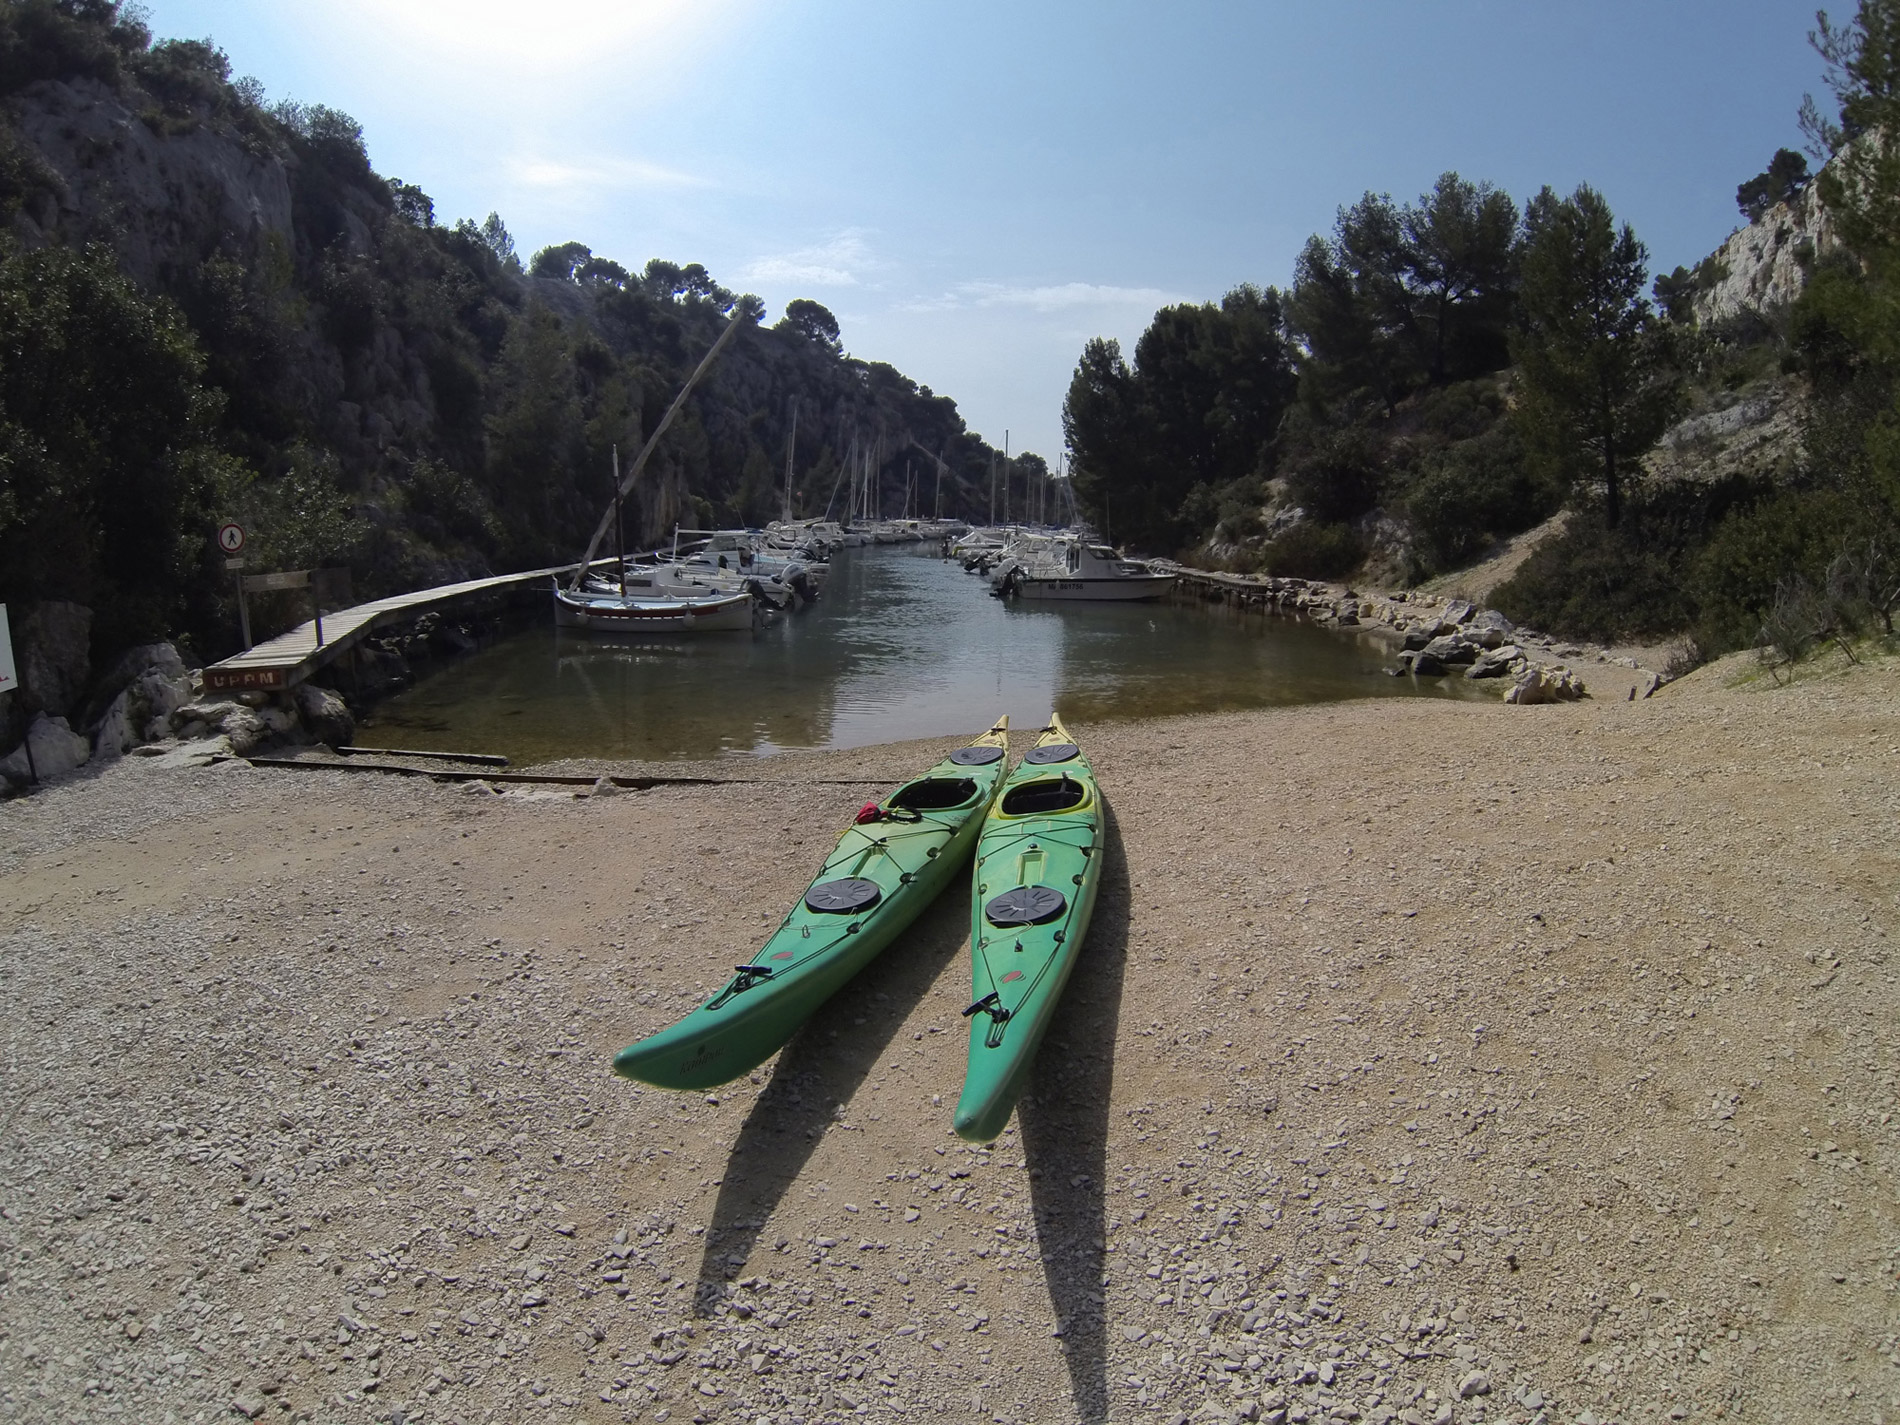 Calanque de Port Miou Calanc'O Kayak Paddle Cassis